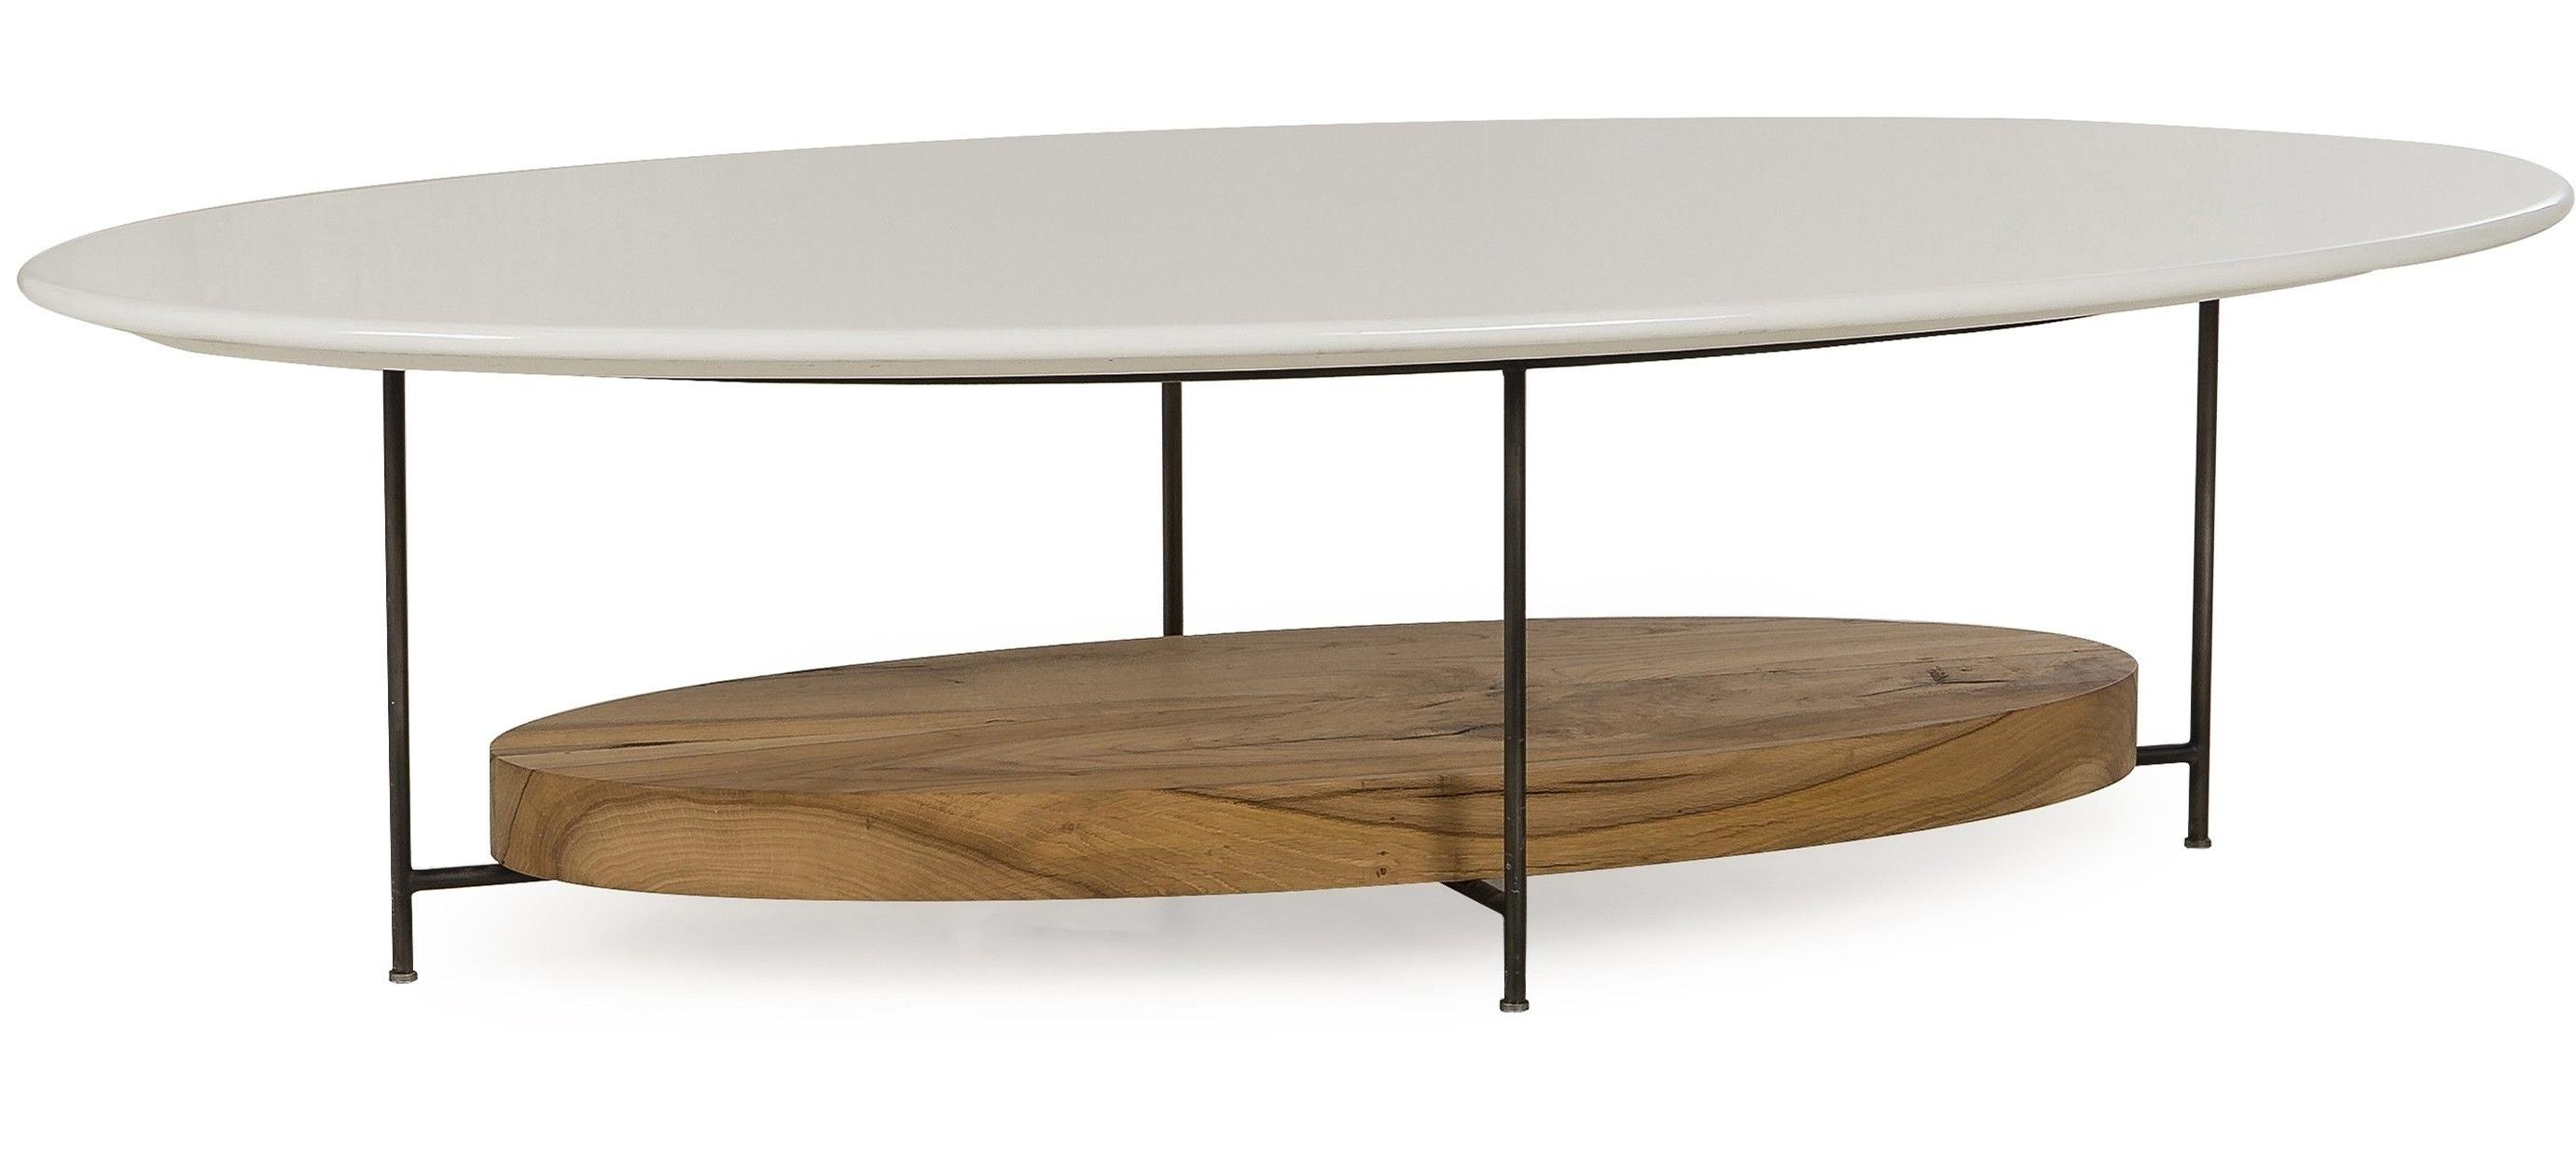 Thomas Bina Olivia Coffee Table (View 13 of 20)